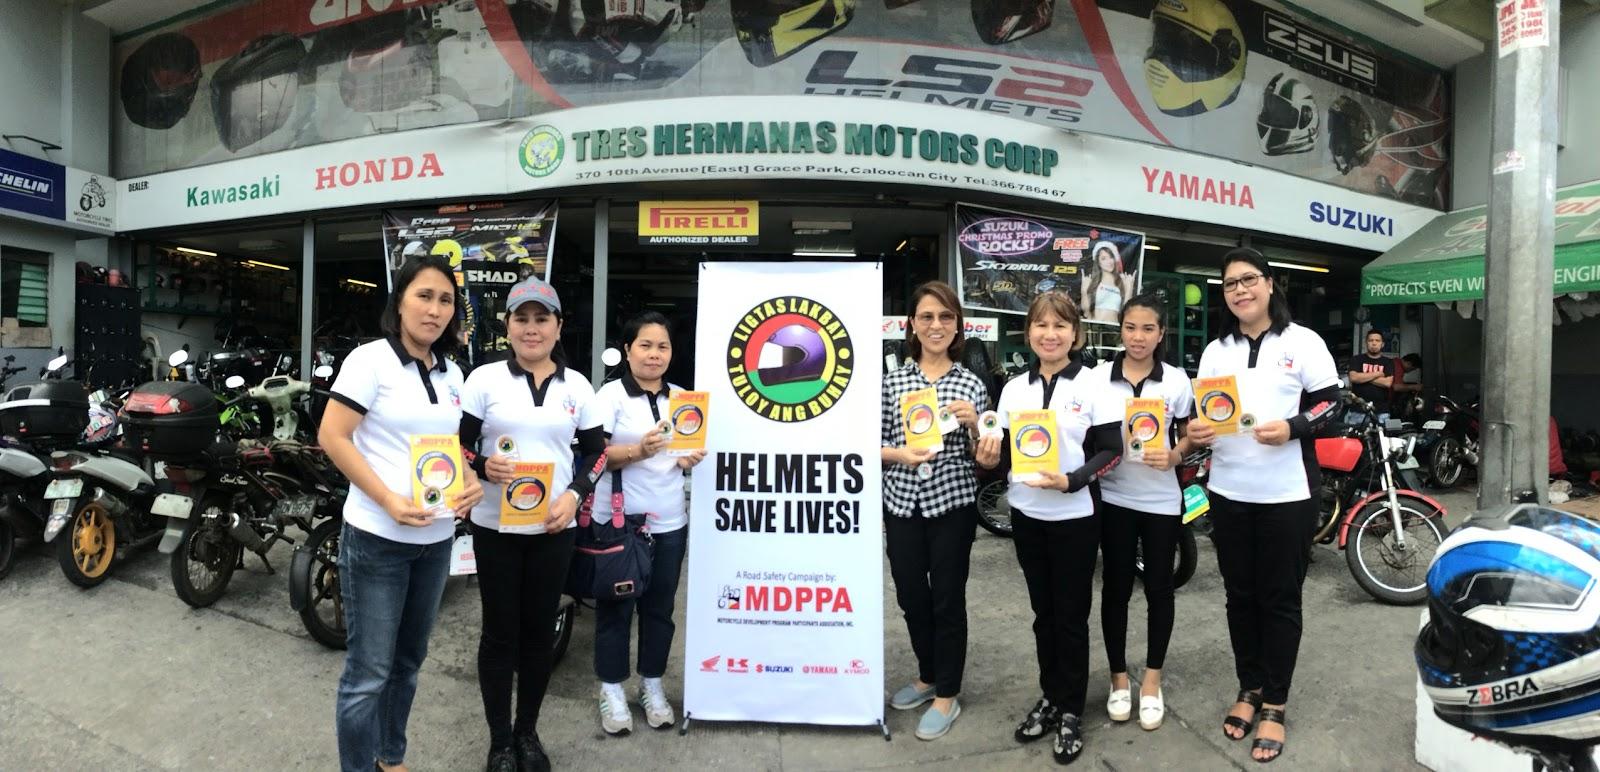 Helmets Save Lives